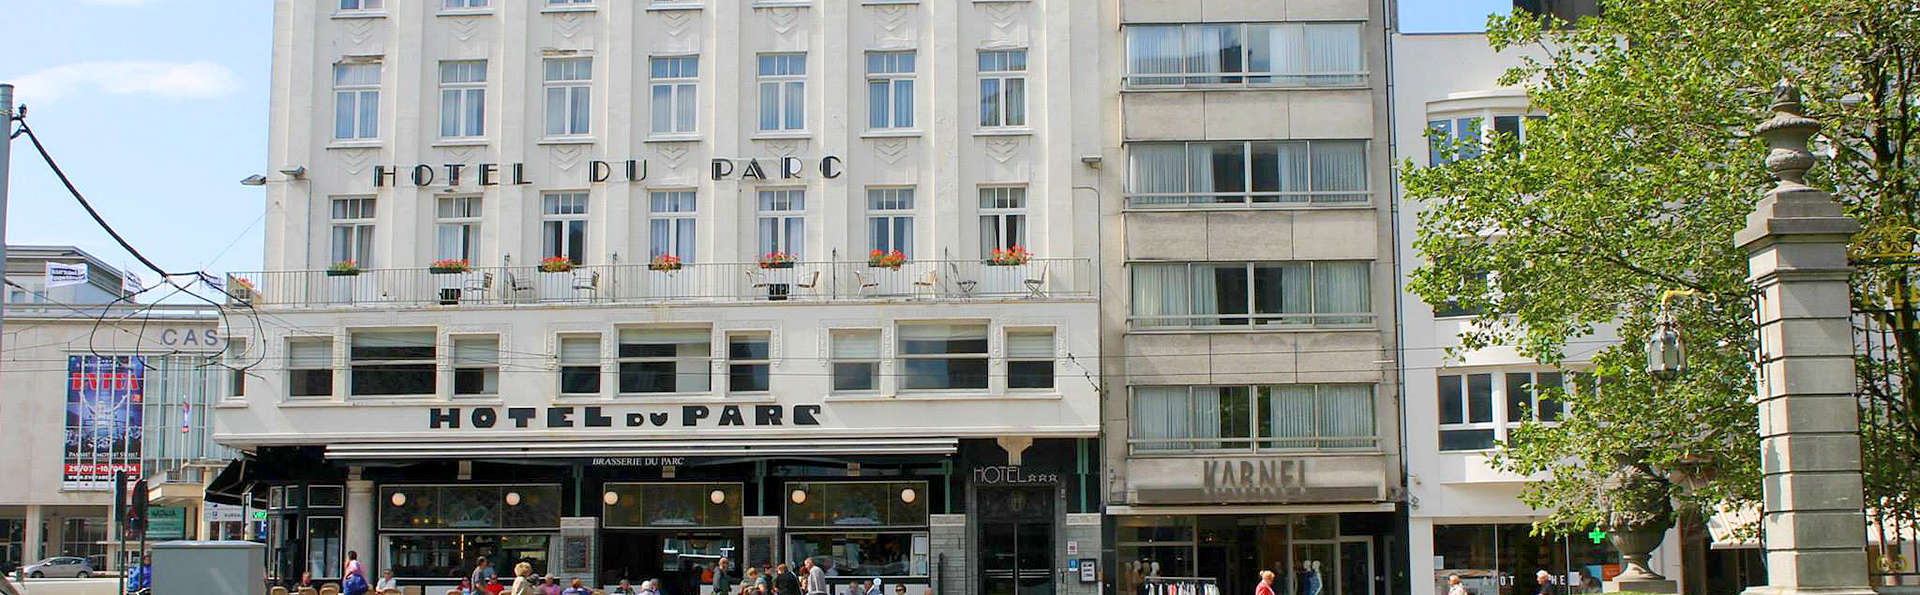 Hotel du Parc - EDIT_Exterior.jpg